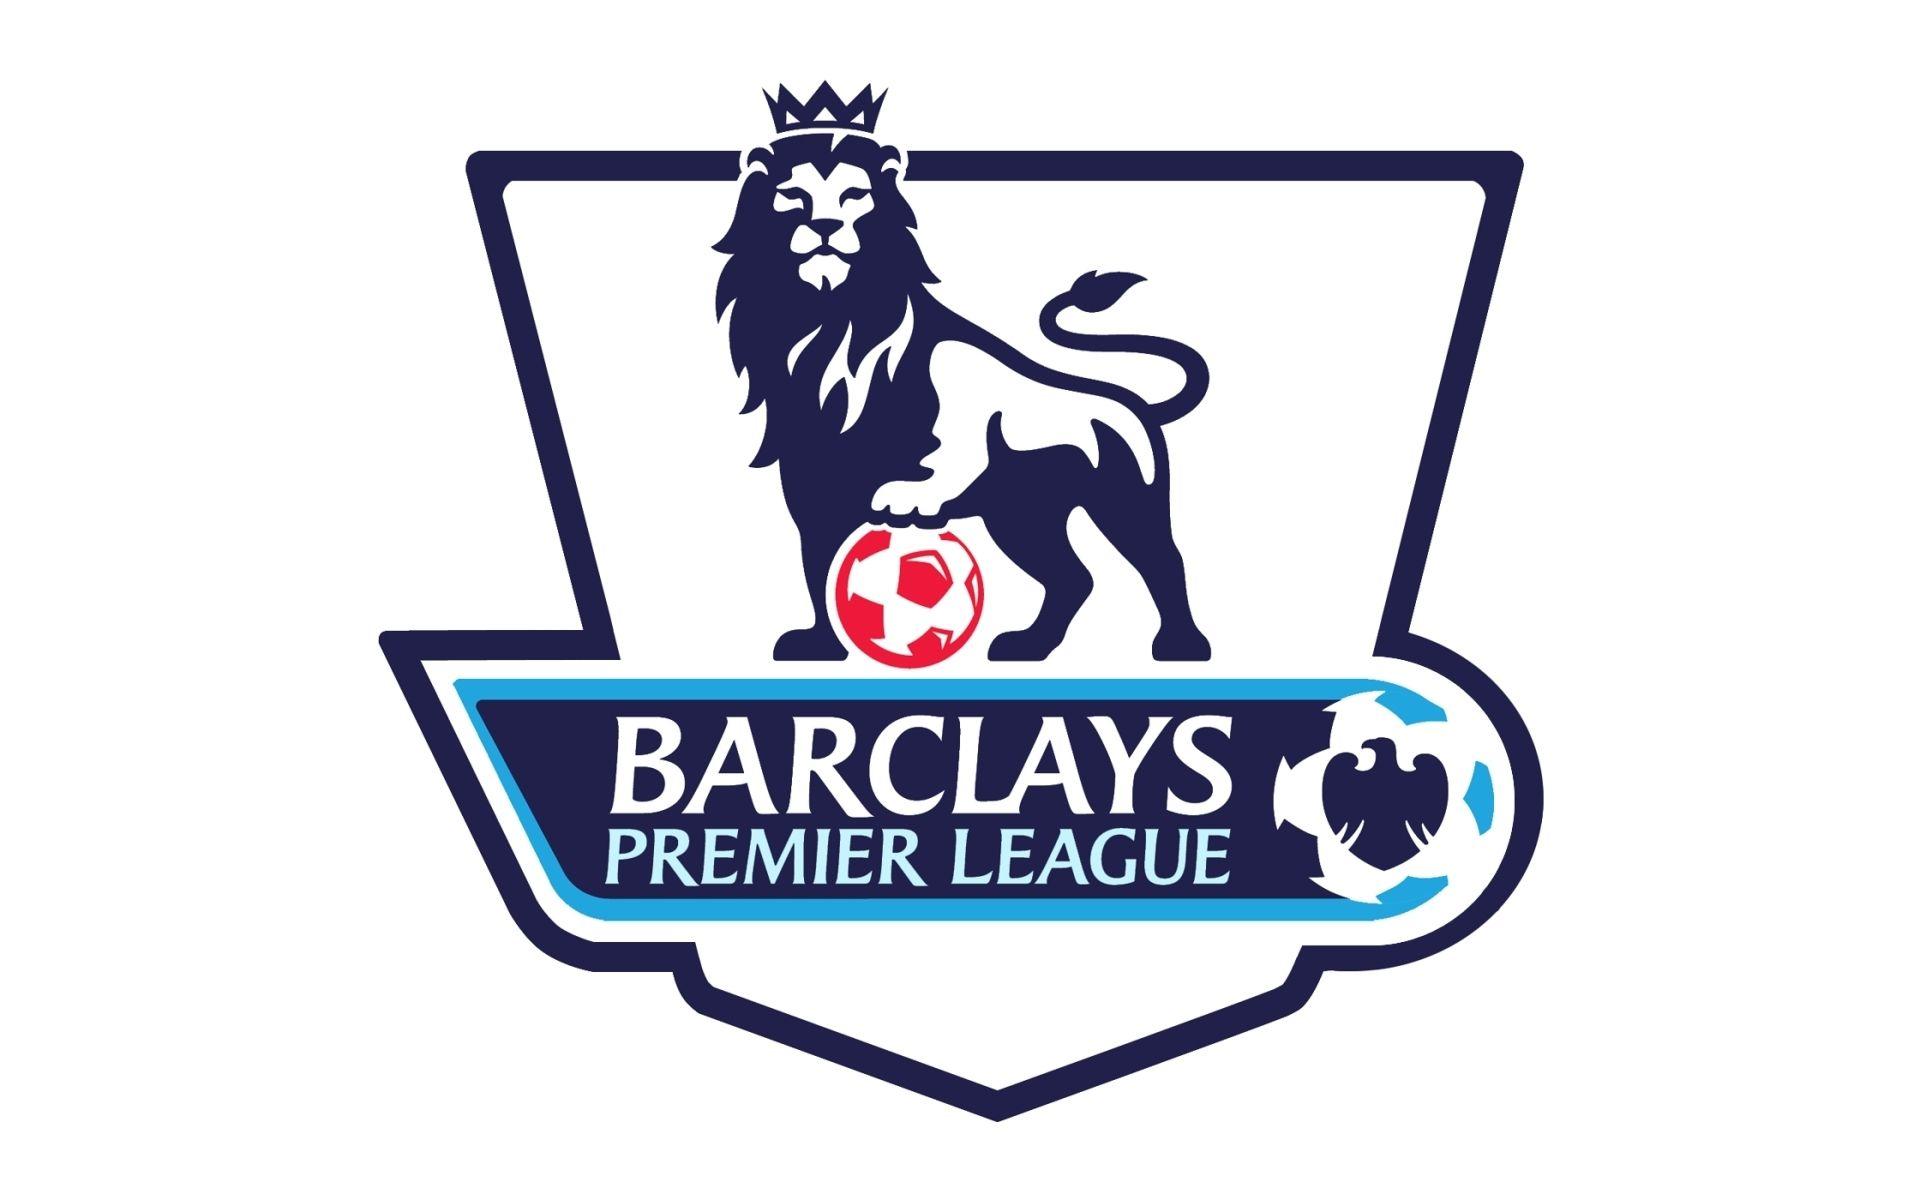 Barclays Premier League Logo Wallpaper HD For Desktop ...